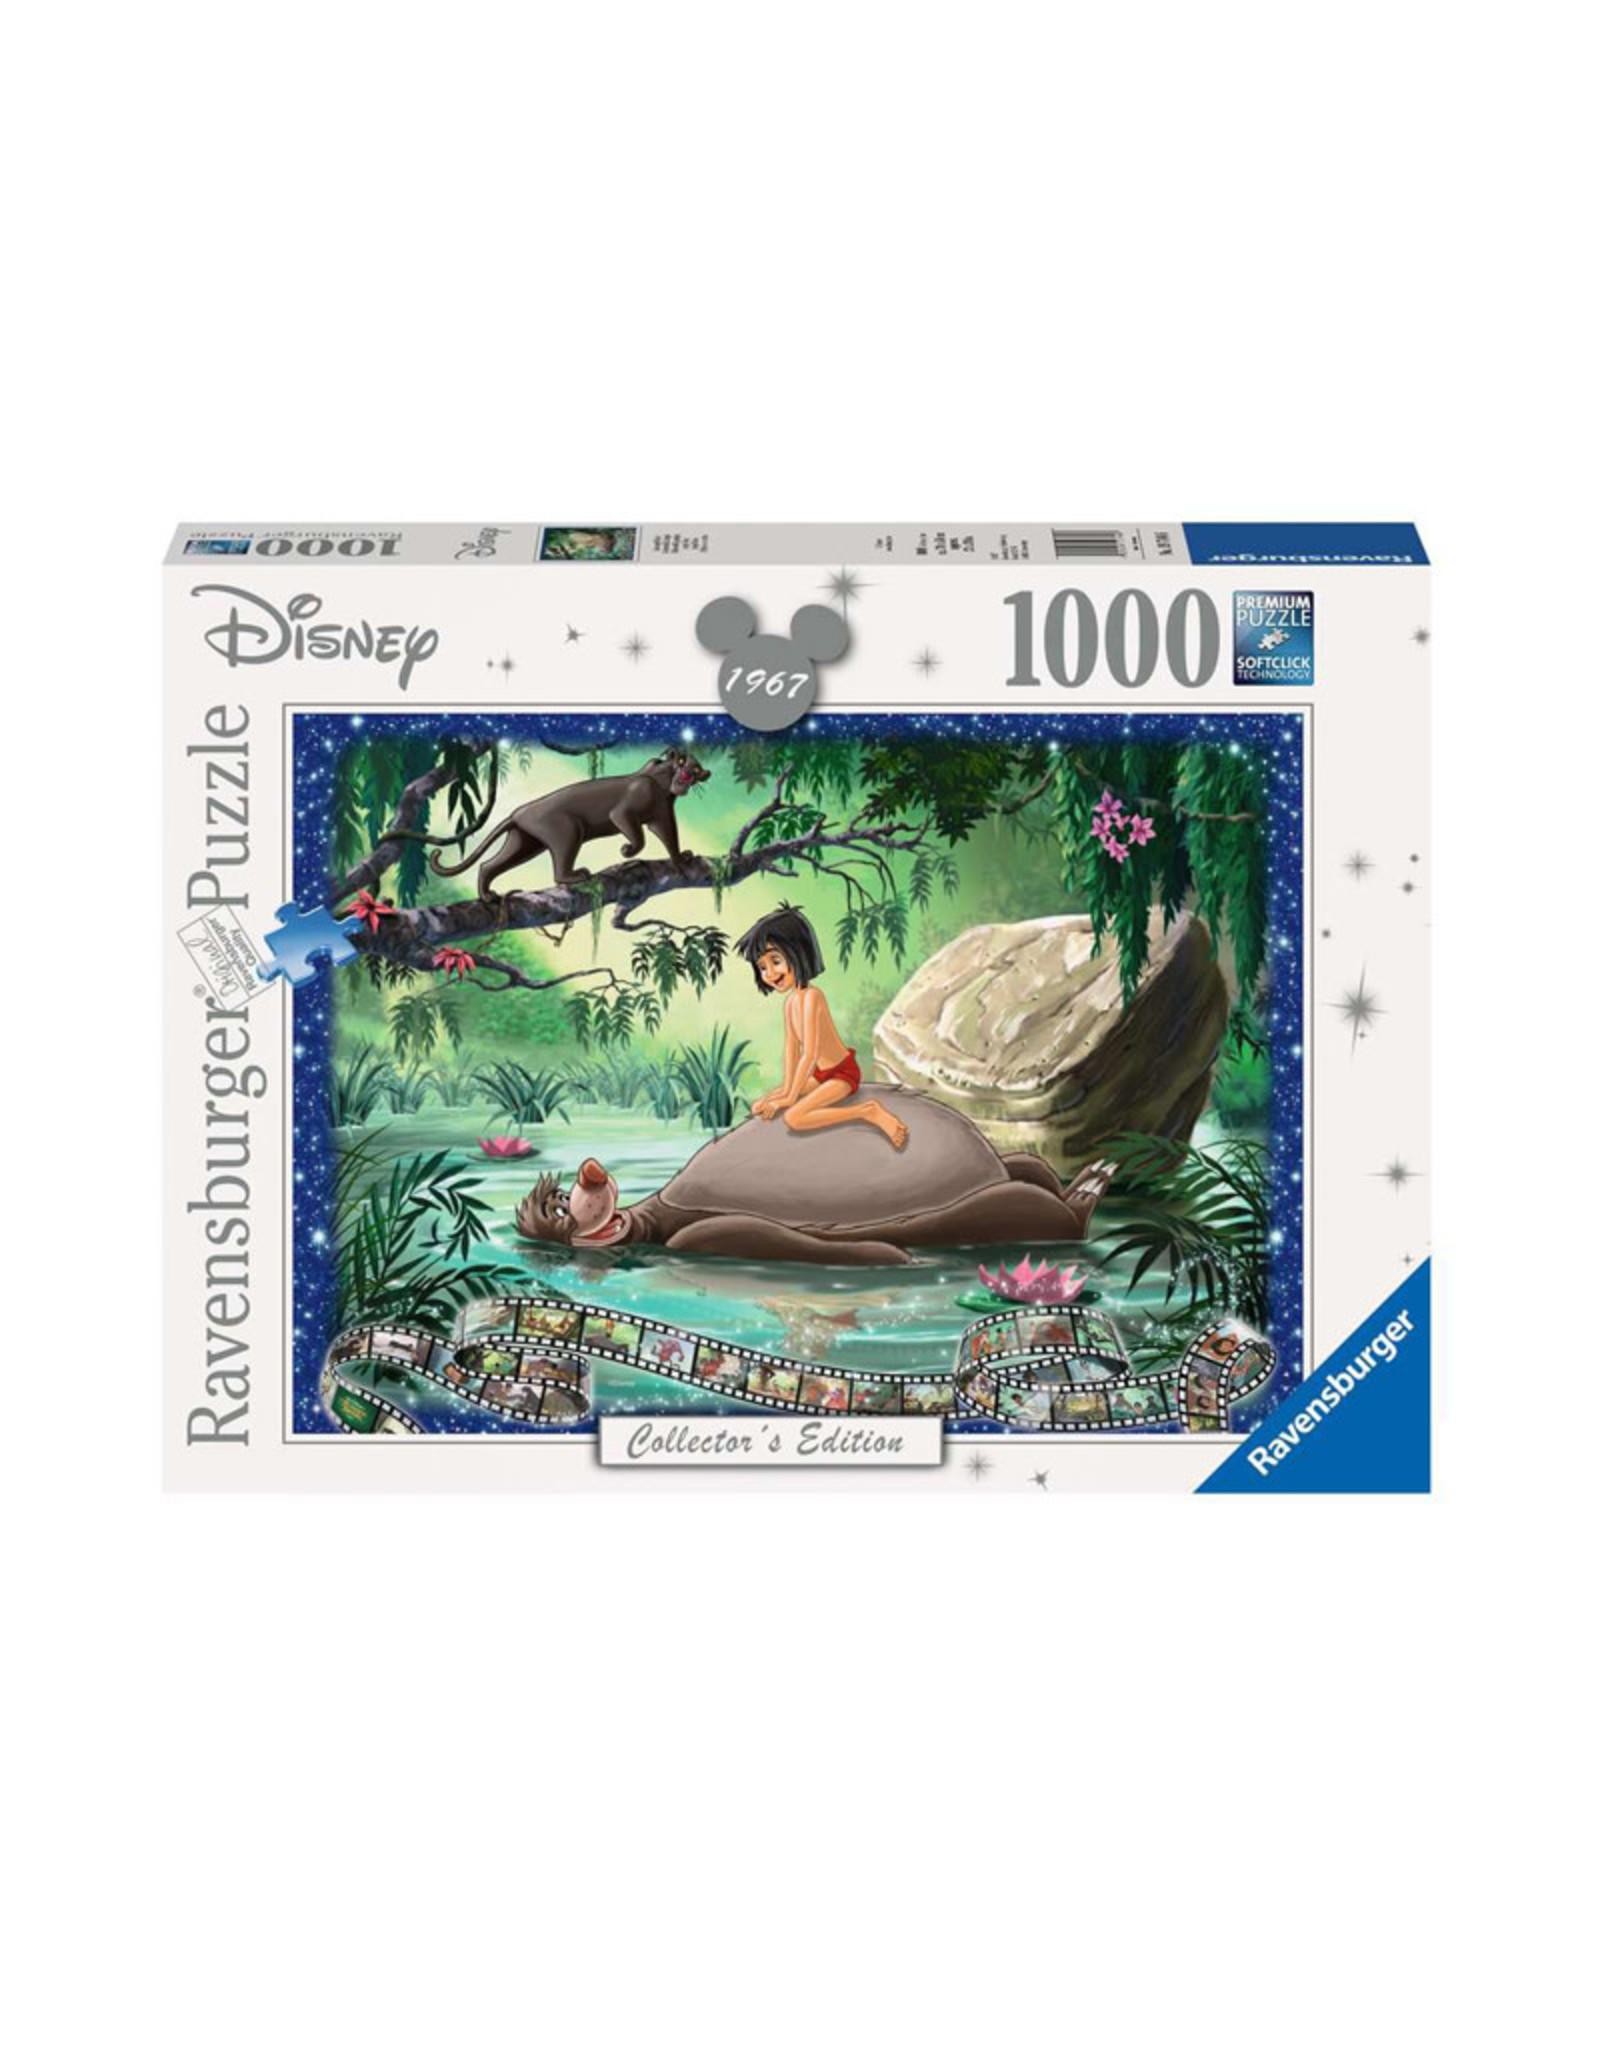 Ravensburger Disney Jungle Book Puzzle 1000 PCS